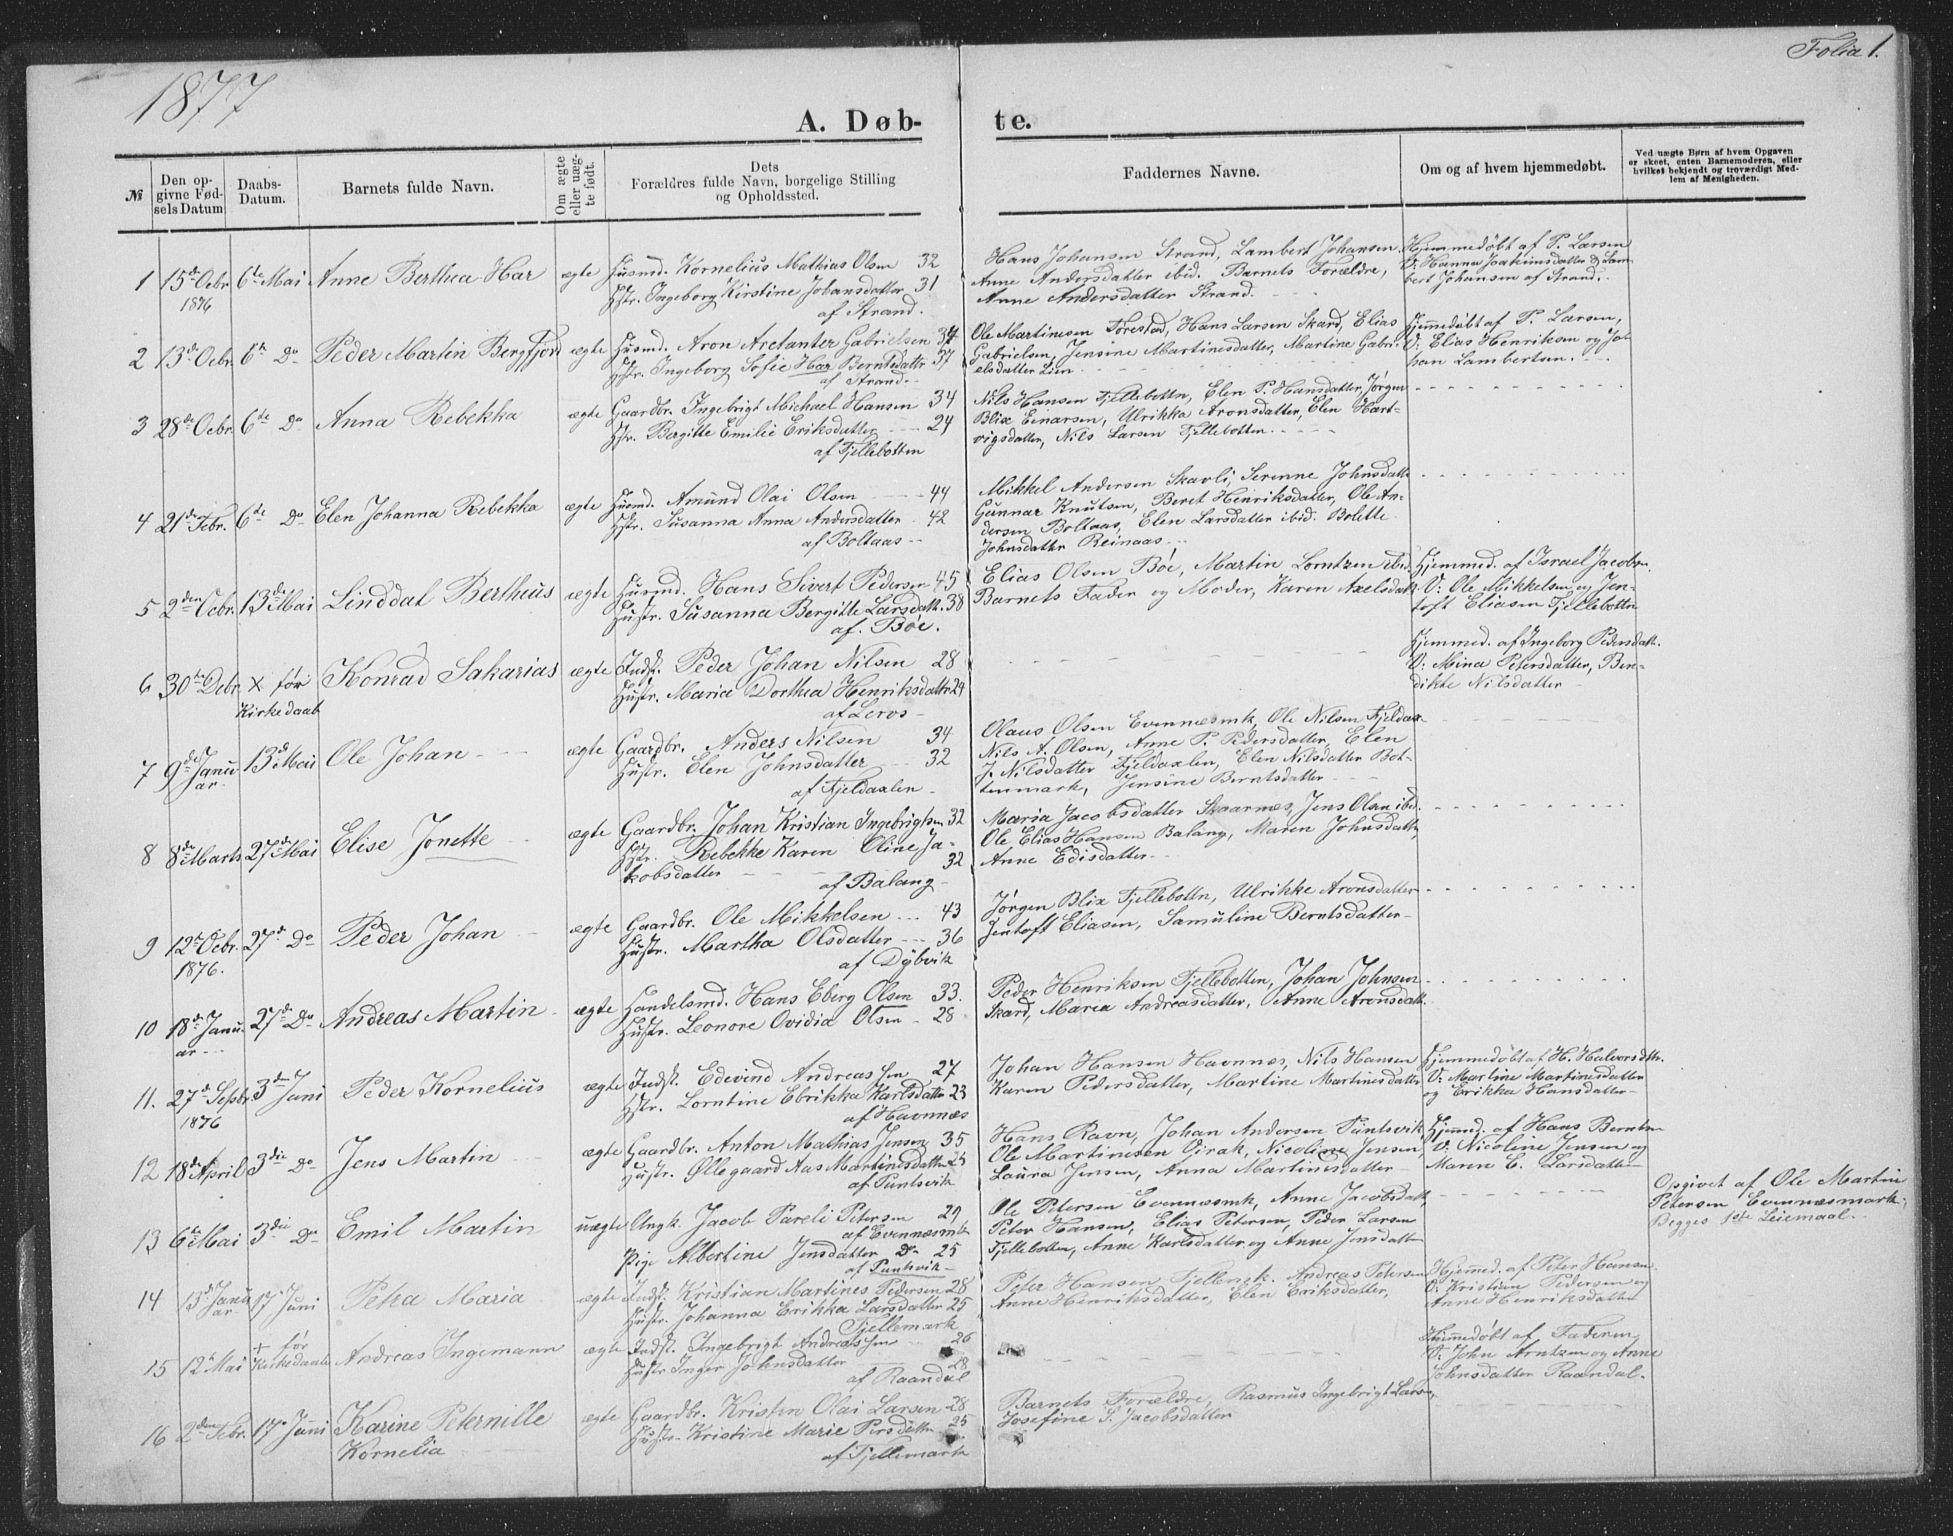 SAT, Ministerialprotokoller, klokkerbøker og fødselsregistre - Nordland, 863/L0913: Klokkerbok nr. 863C03, 1877-1885, s. 1